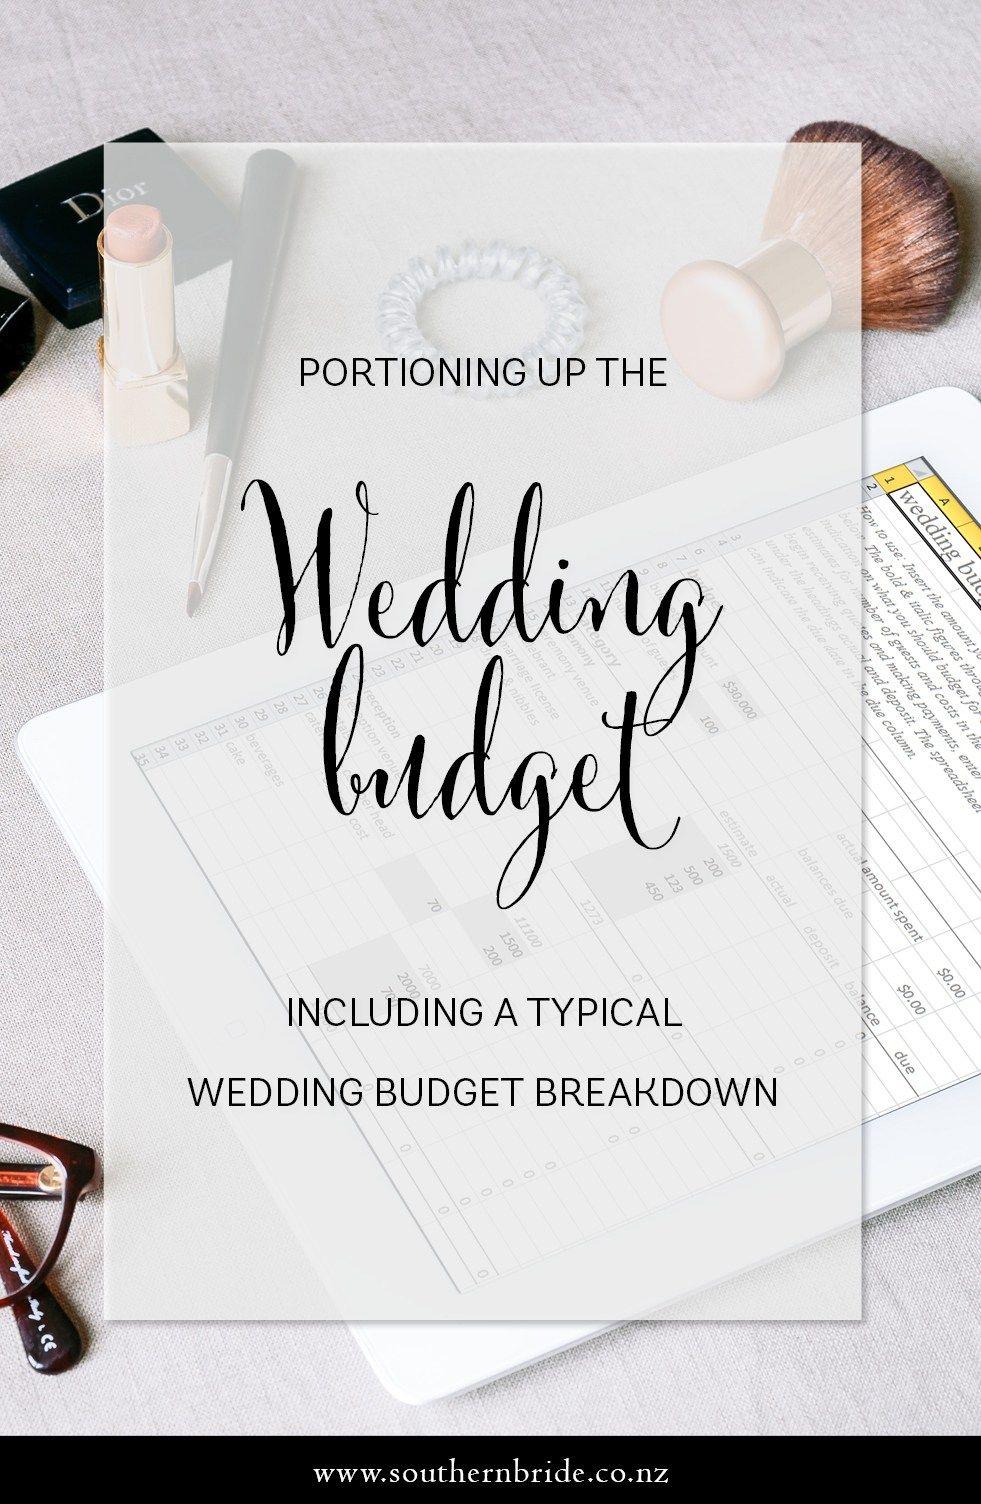 Portioning up the wedding budget Wedding budget